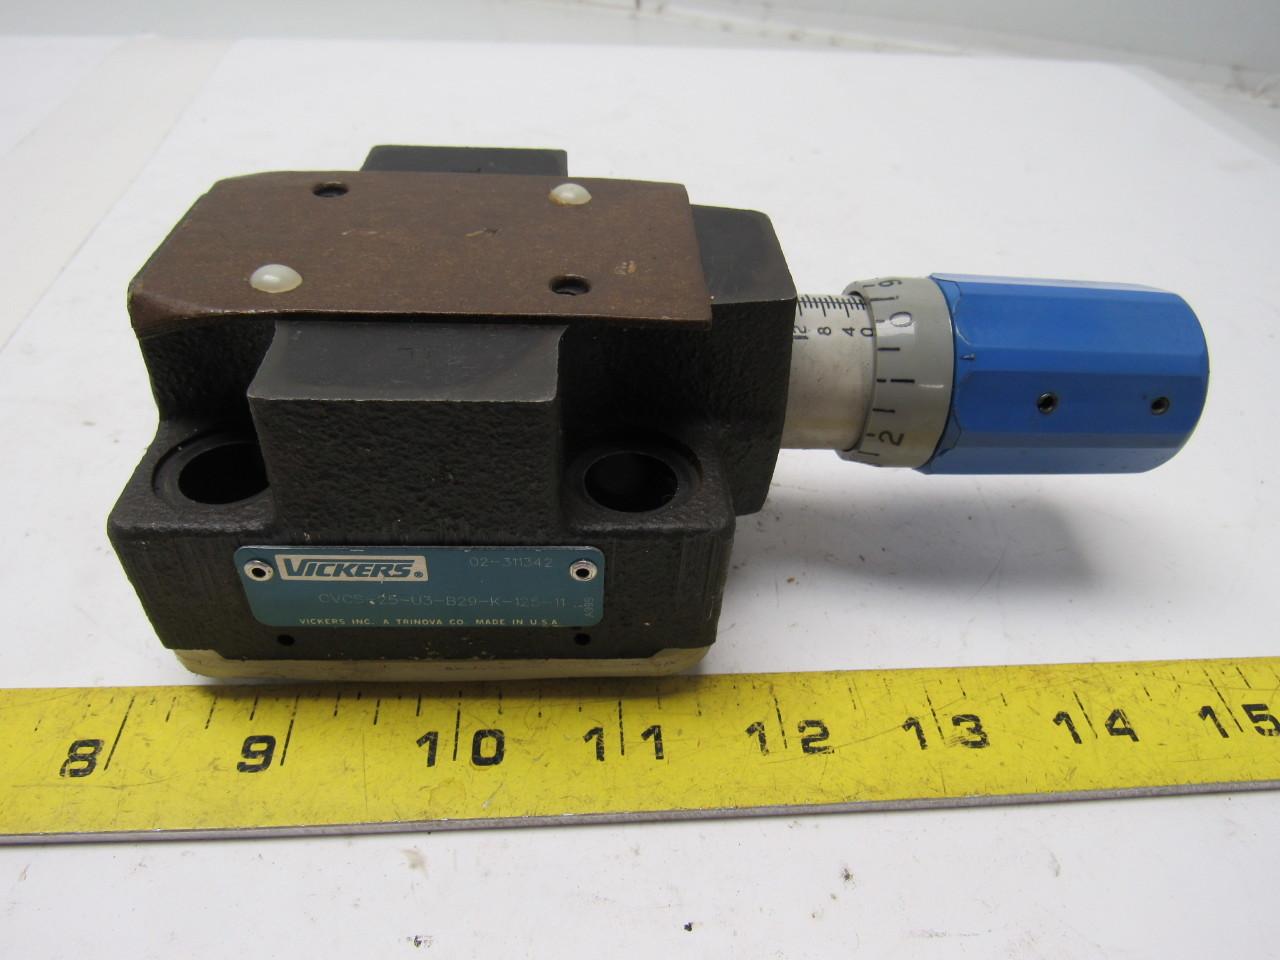 VICKERS CVCS-25-U3-B29-K-125-11 02-311342 Hydraulic Control Valve